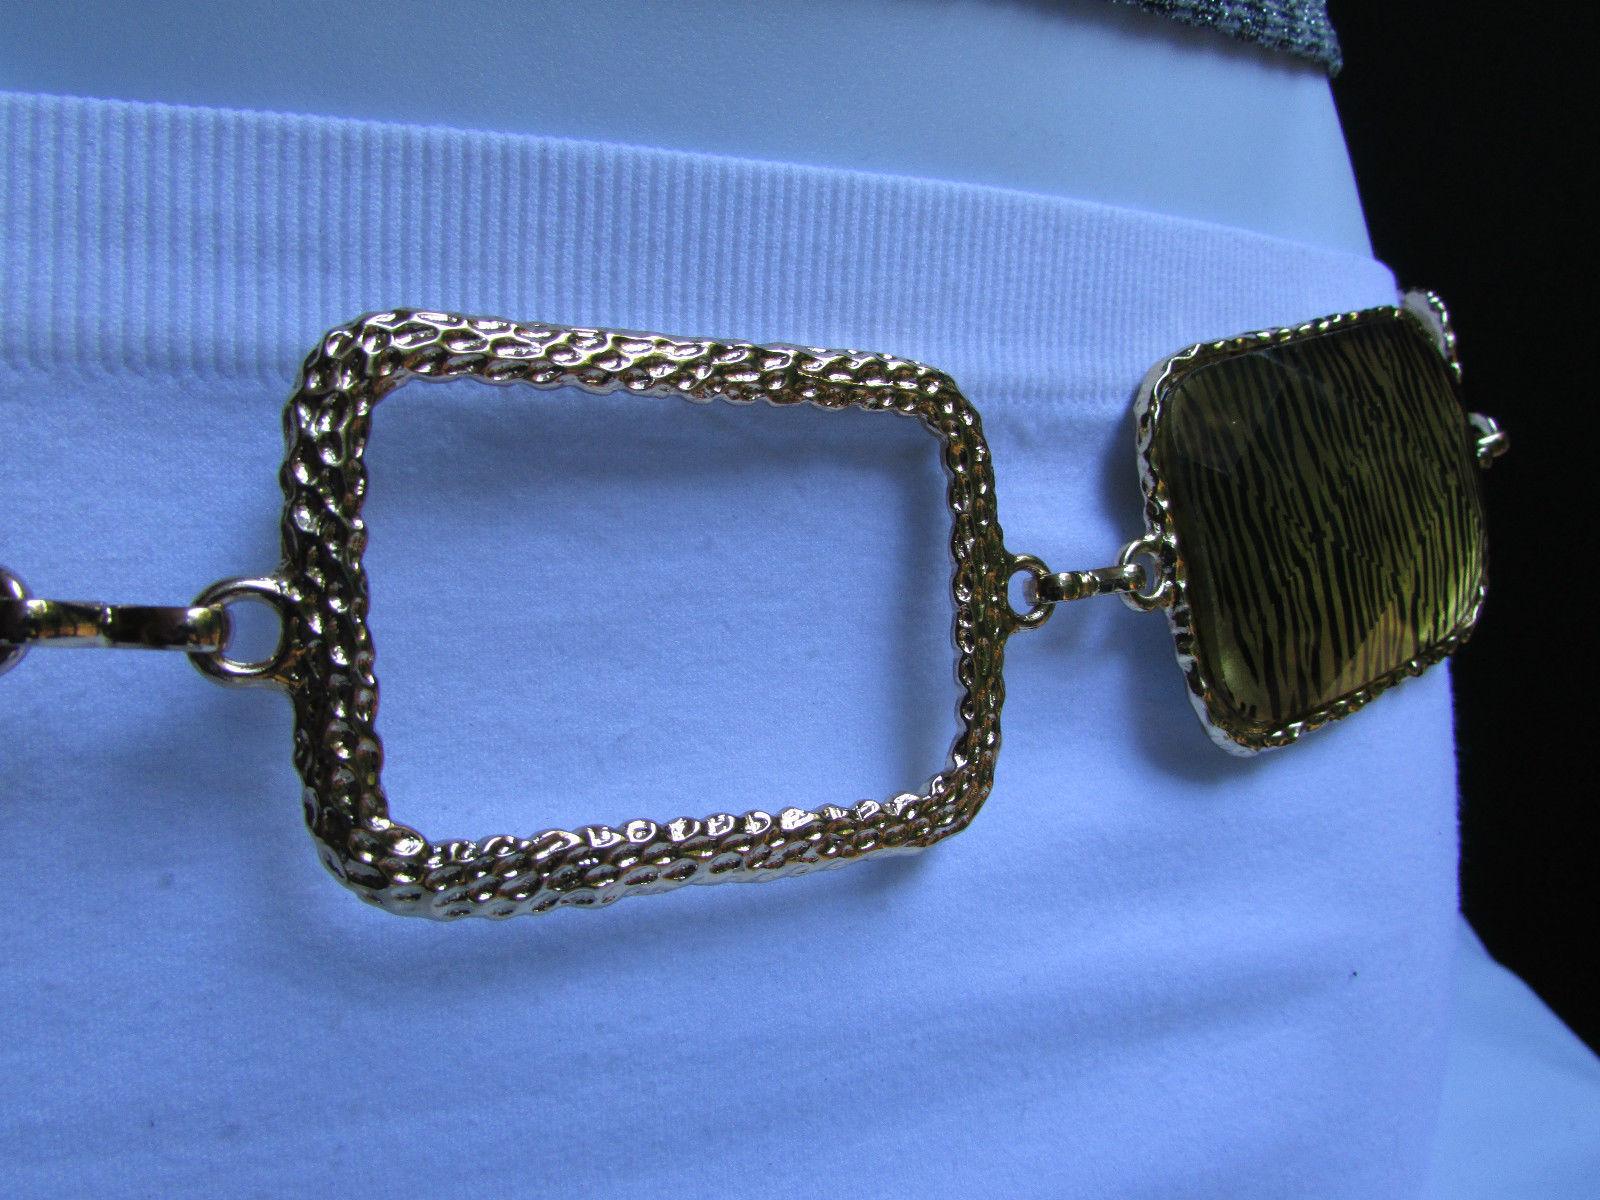 "New Women Belt Fashion Waist Hip Gold Leopard Squares Metal Chain 24""-42"" Xs-Xl"